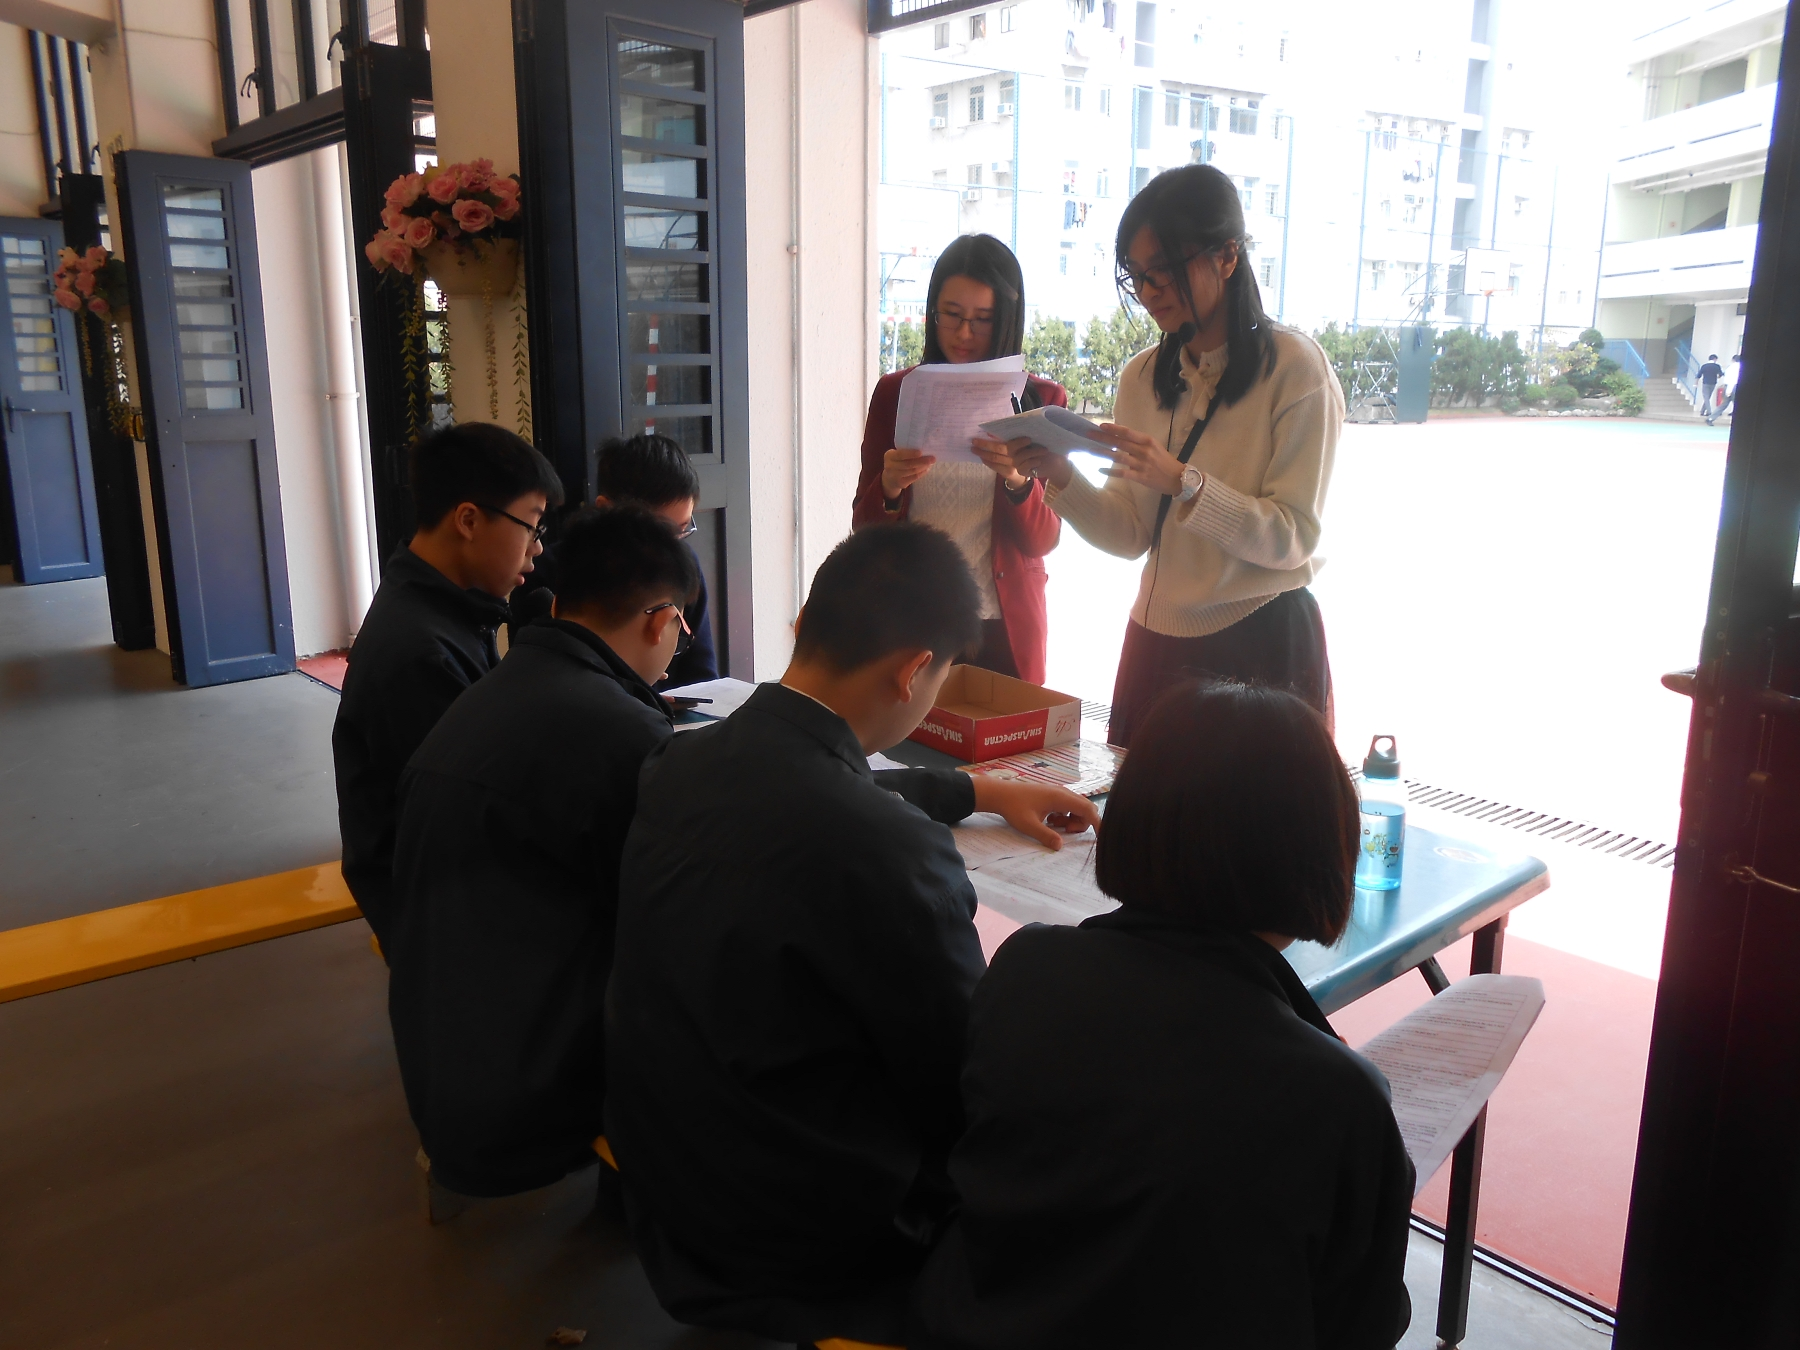 http://npc.edu.hk/sites/default/files/dscn9747.jpg